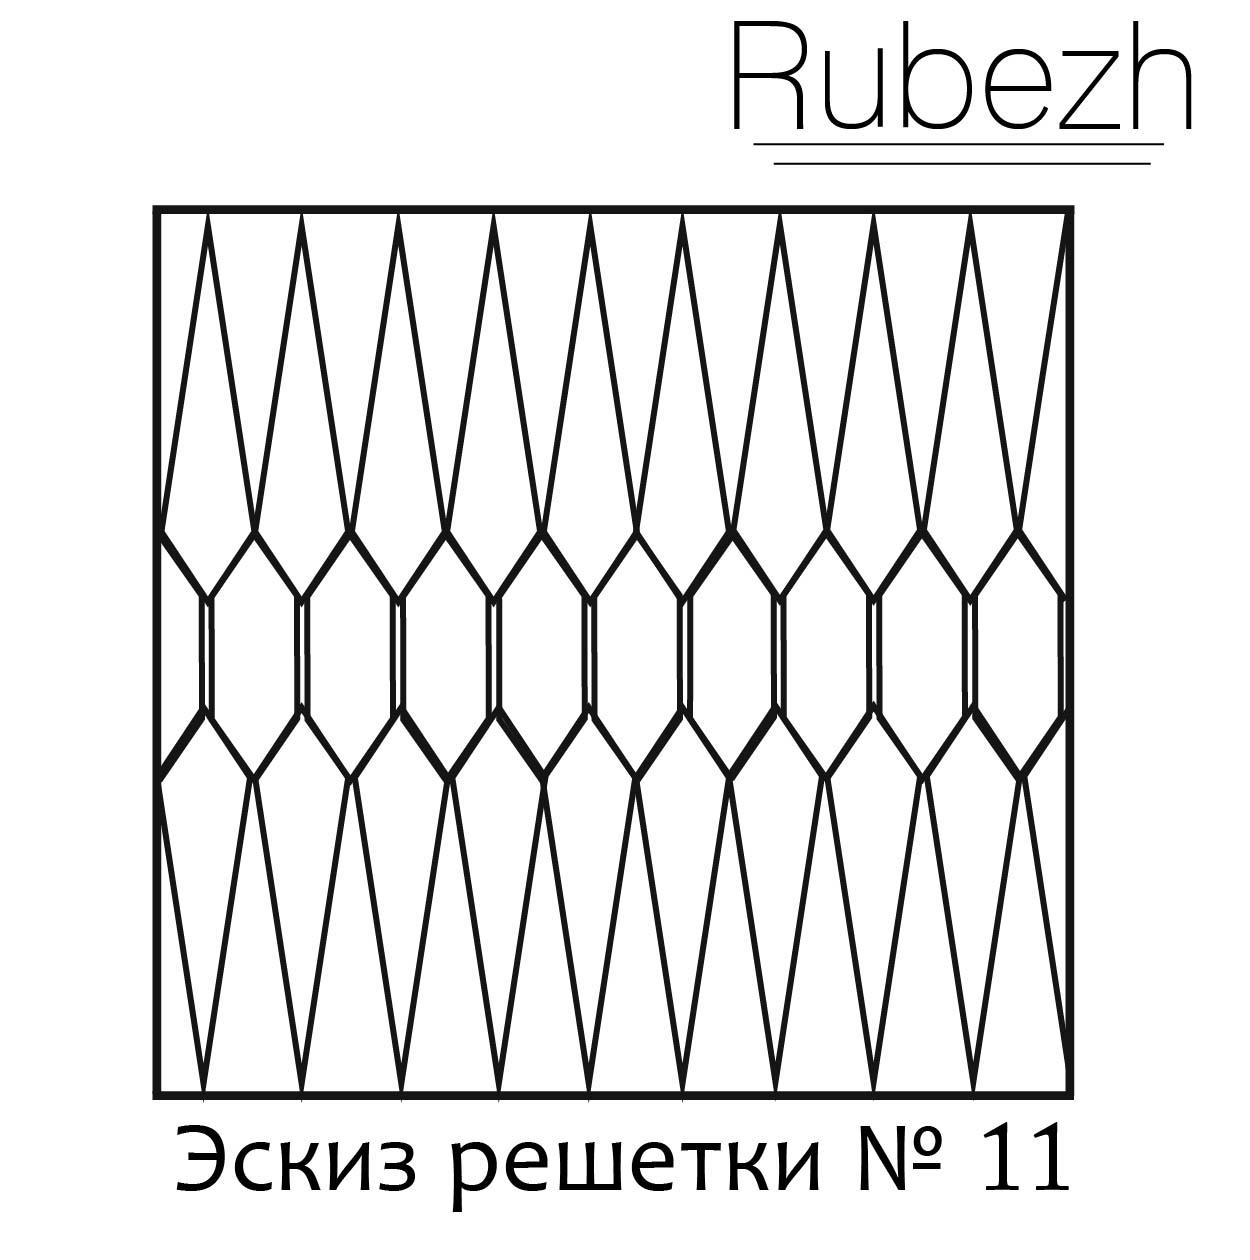 Эскиз решетки № 11